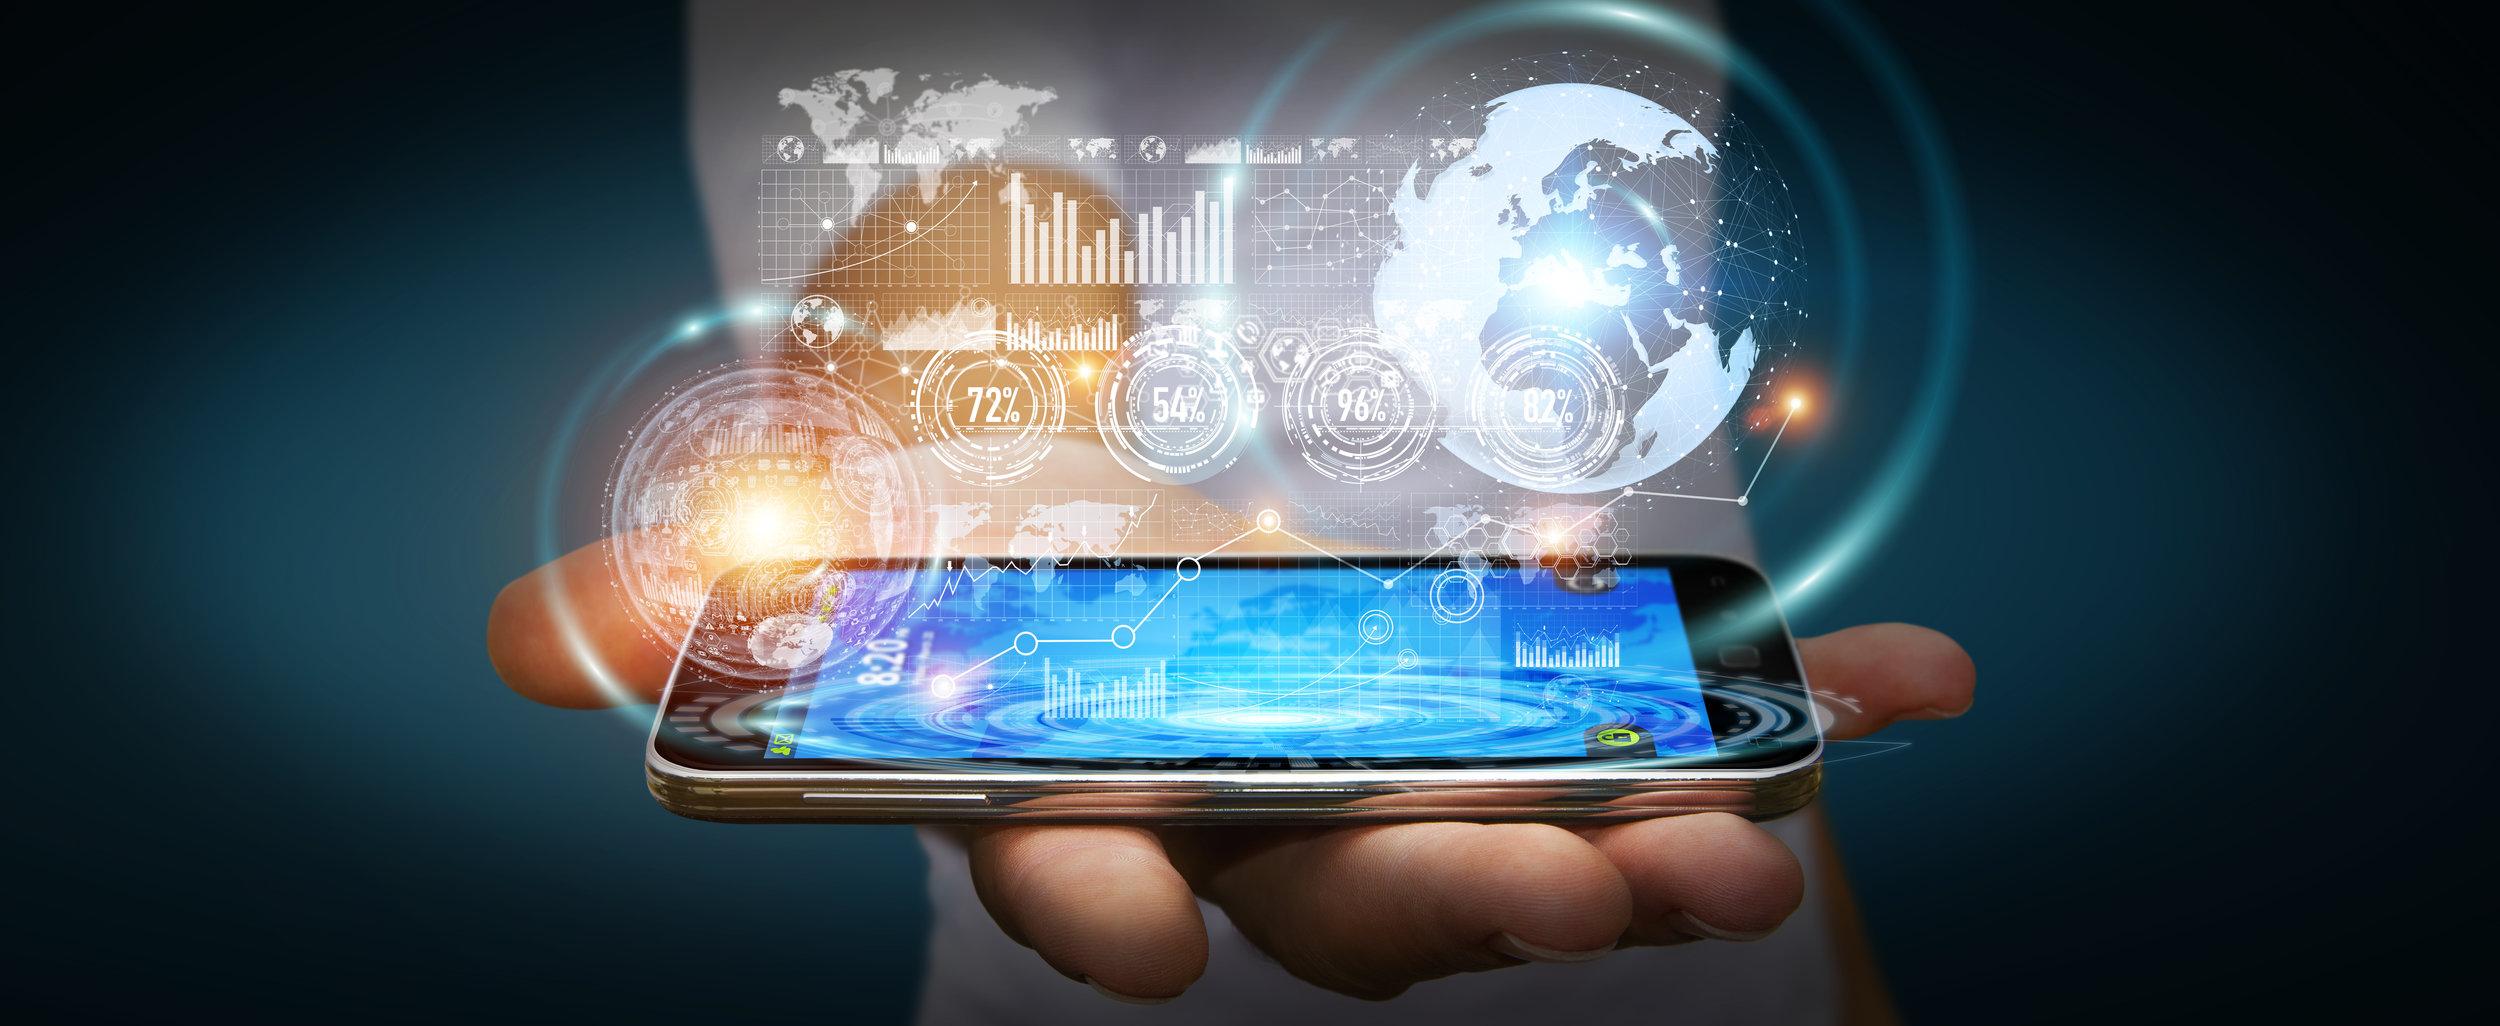 investment-opportunities-technology-cellular-data.jpg